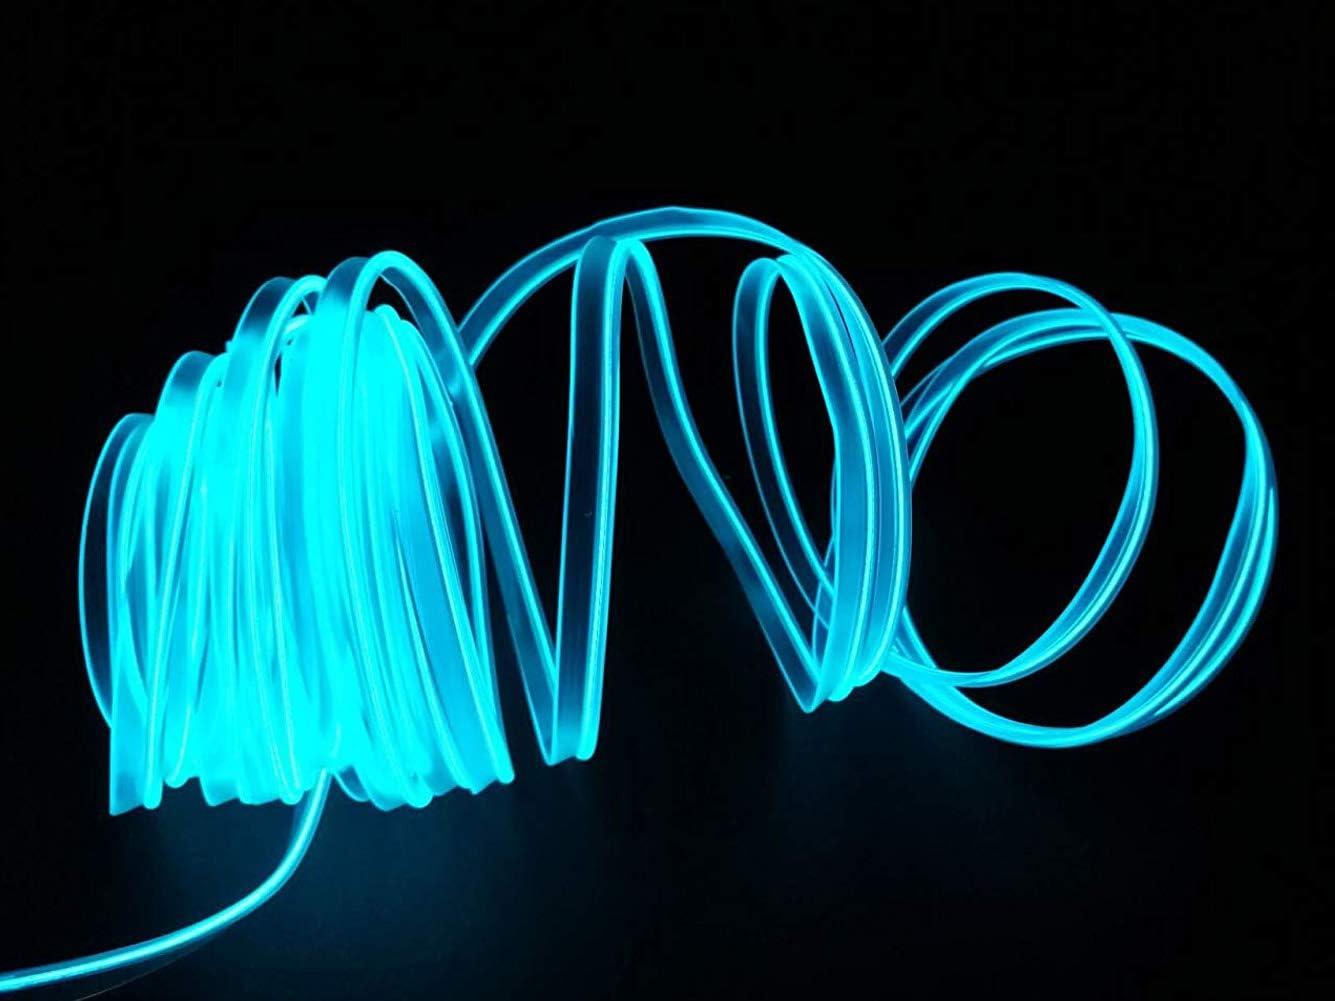 Gelb 6FT USB Neon EL Draht Gl/ühender Elektrolumineszenzdraht f/ür Valentine Christmas Festival Party Licht Dekoration 2M